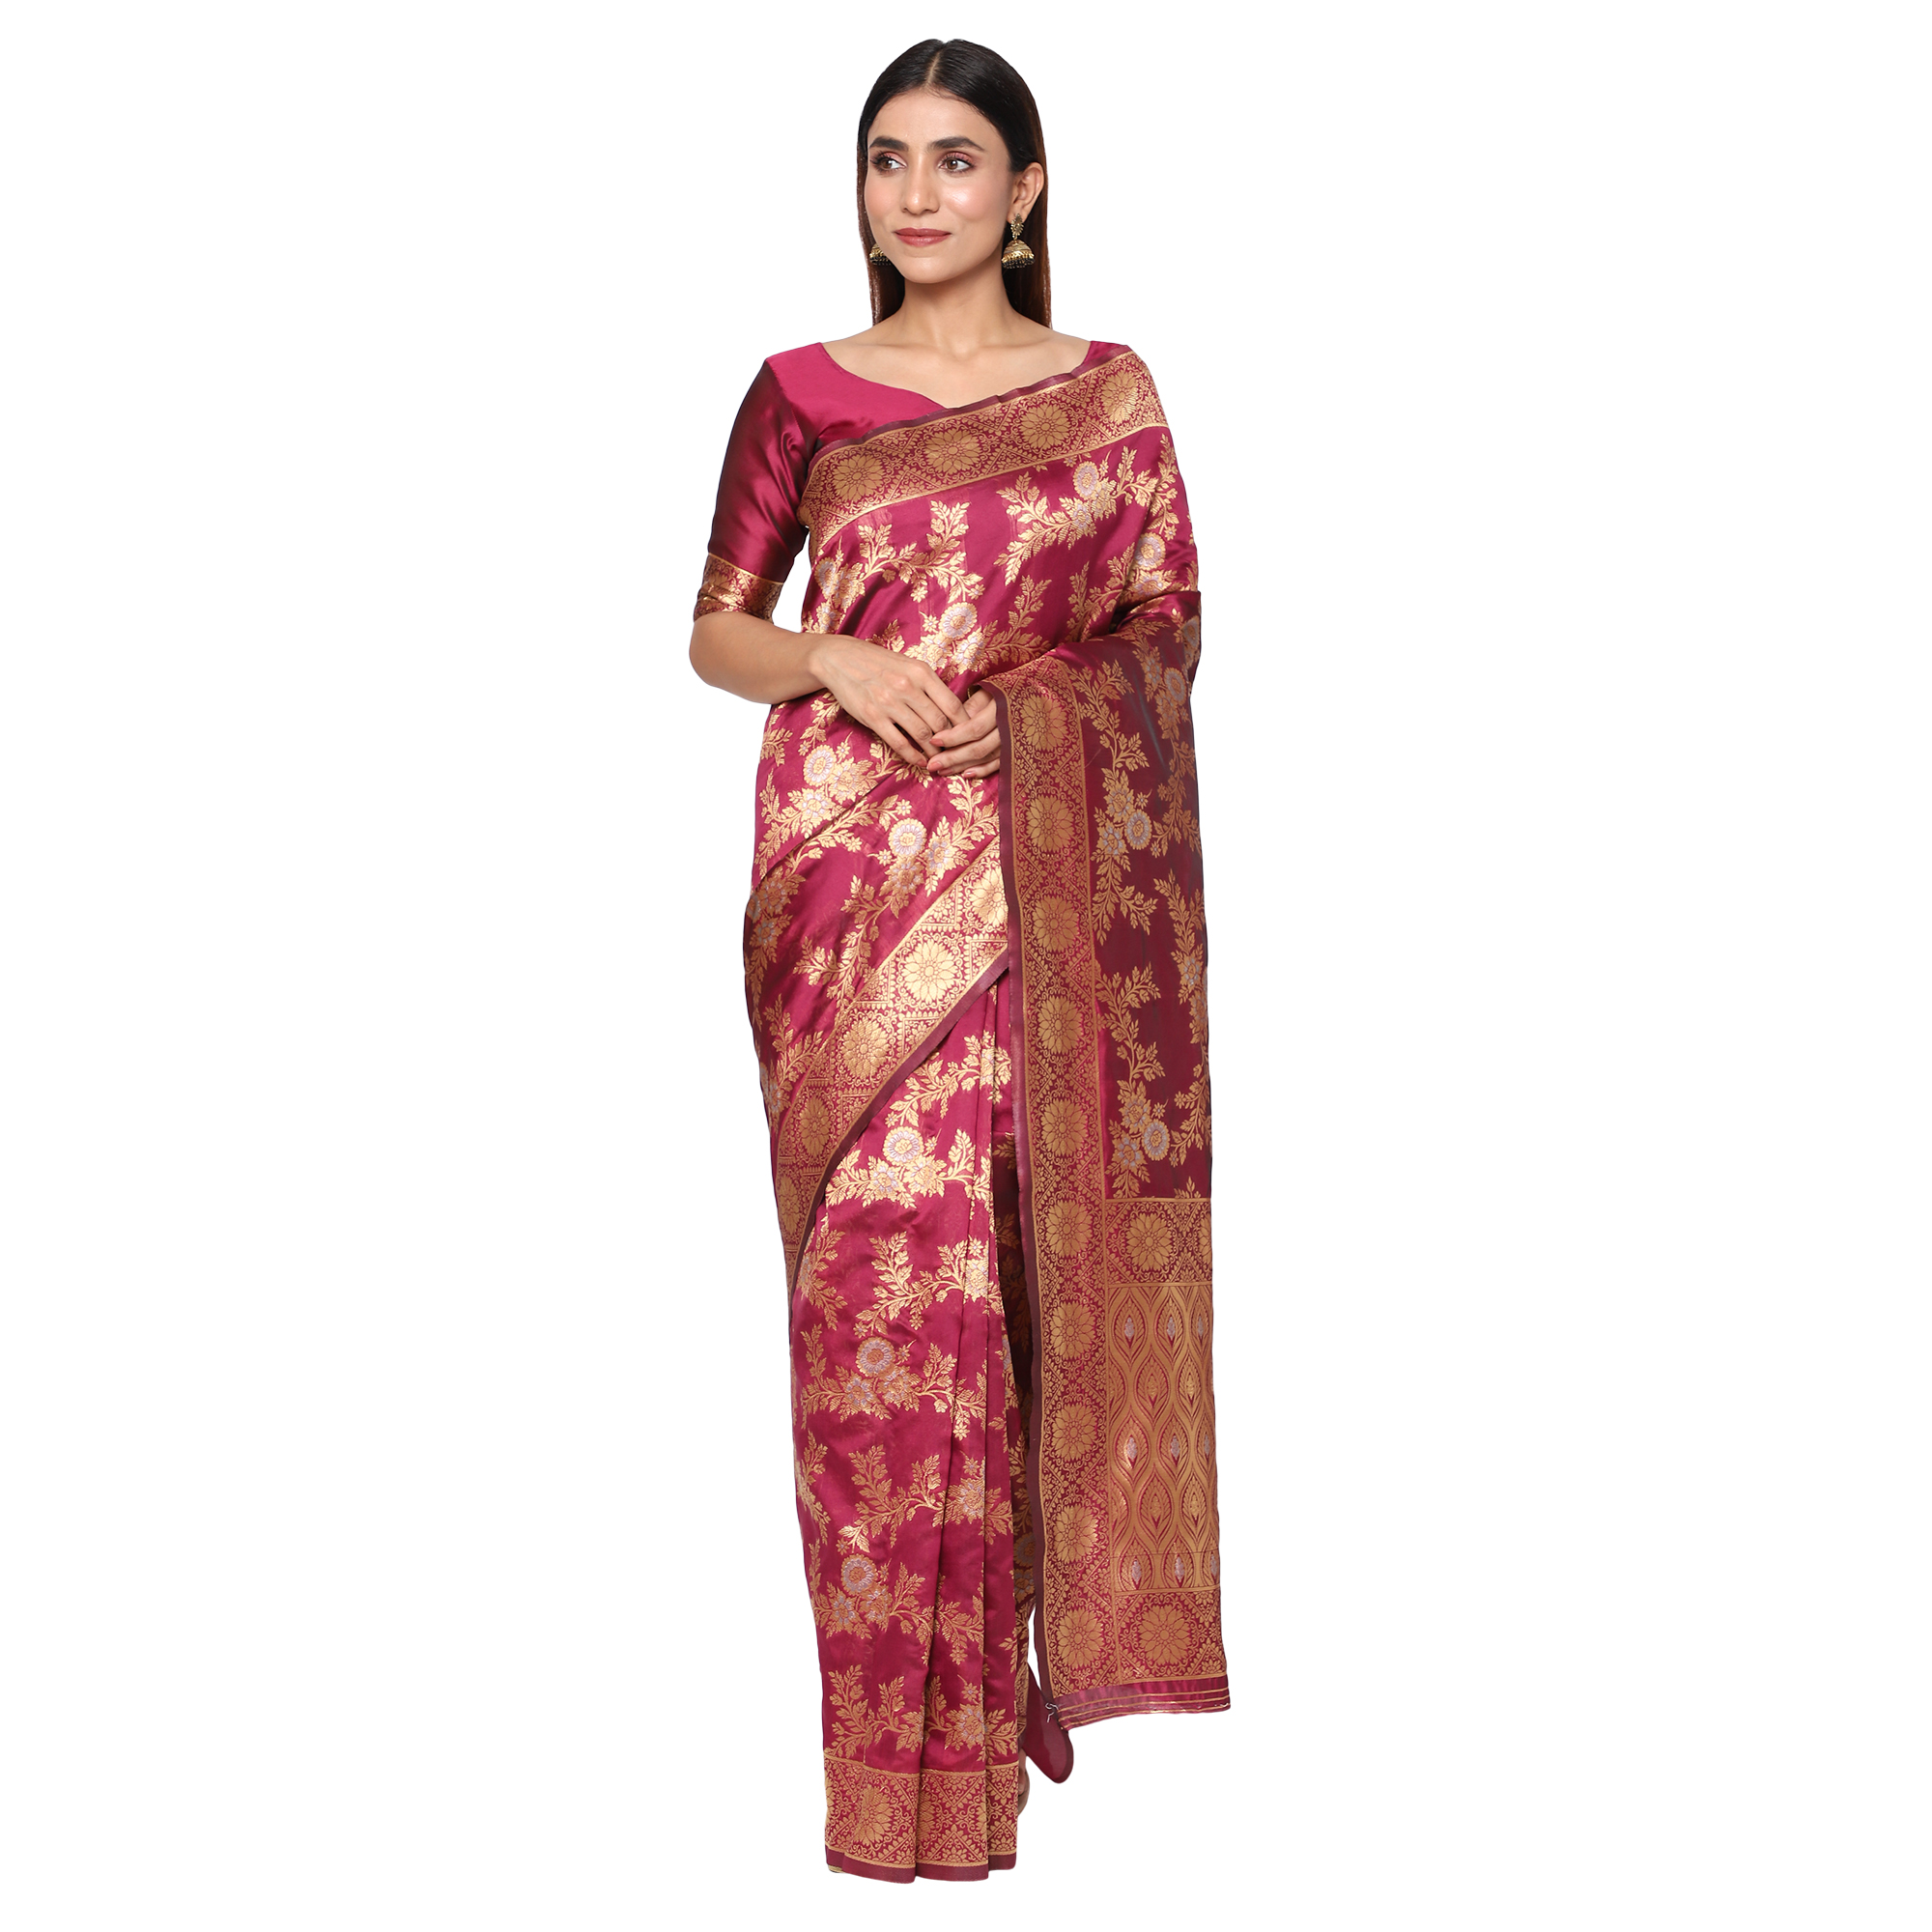 Glemora | Glemora Wine Fancy Ethnic Wear Silk Blend Banarasi Traditional Saree